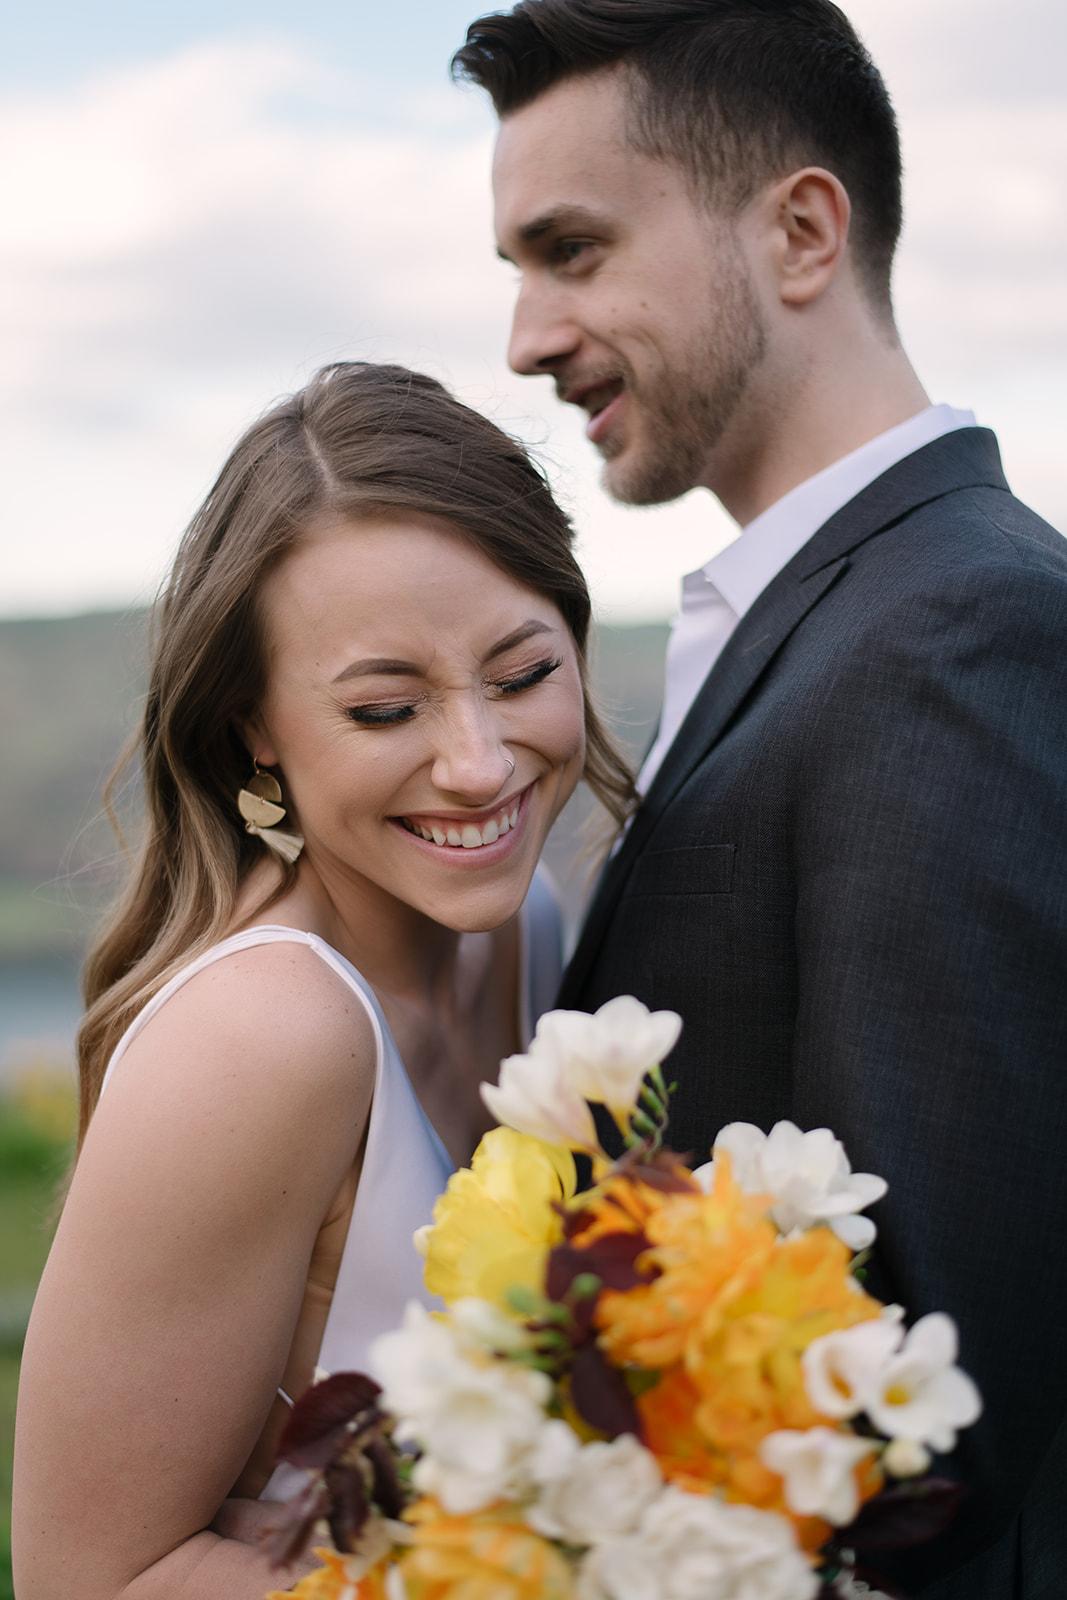 kamea_events_wedding_planner_portland_DeusAmor24.jpg